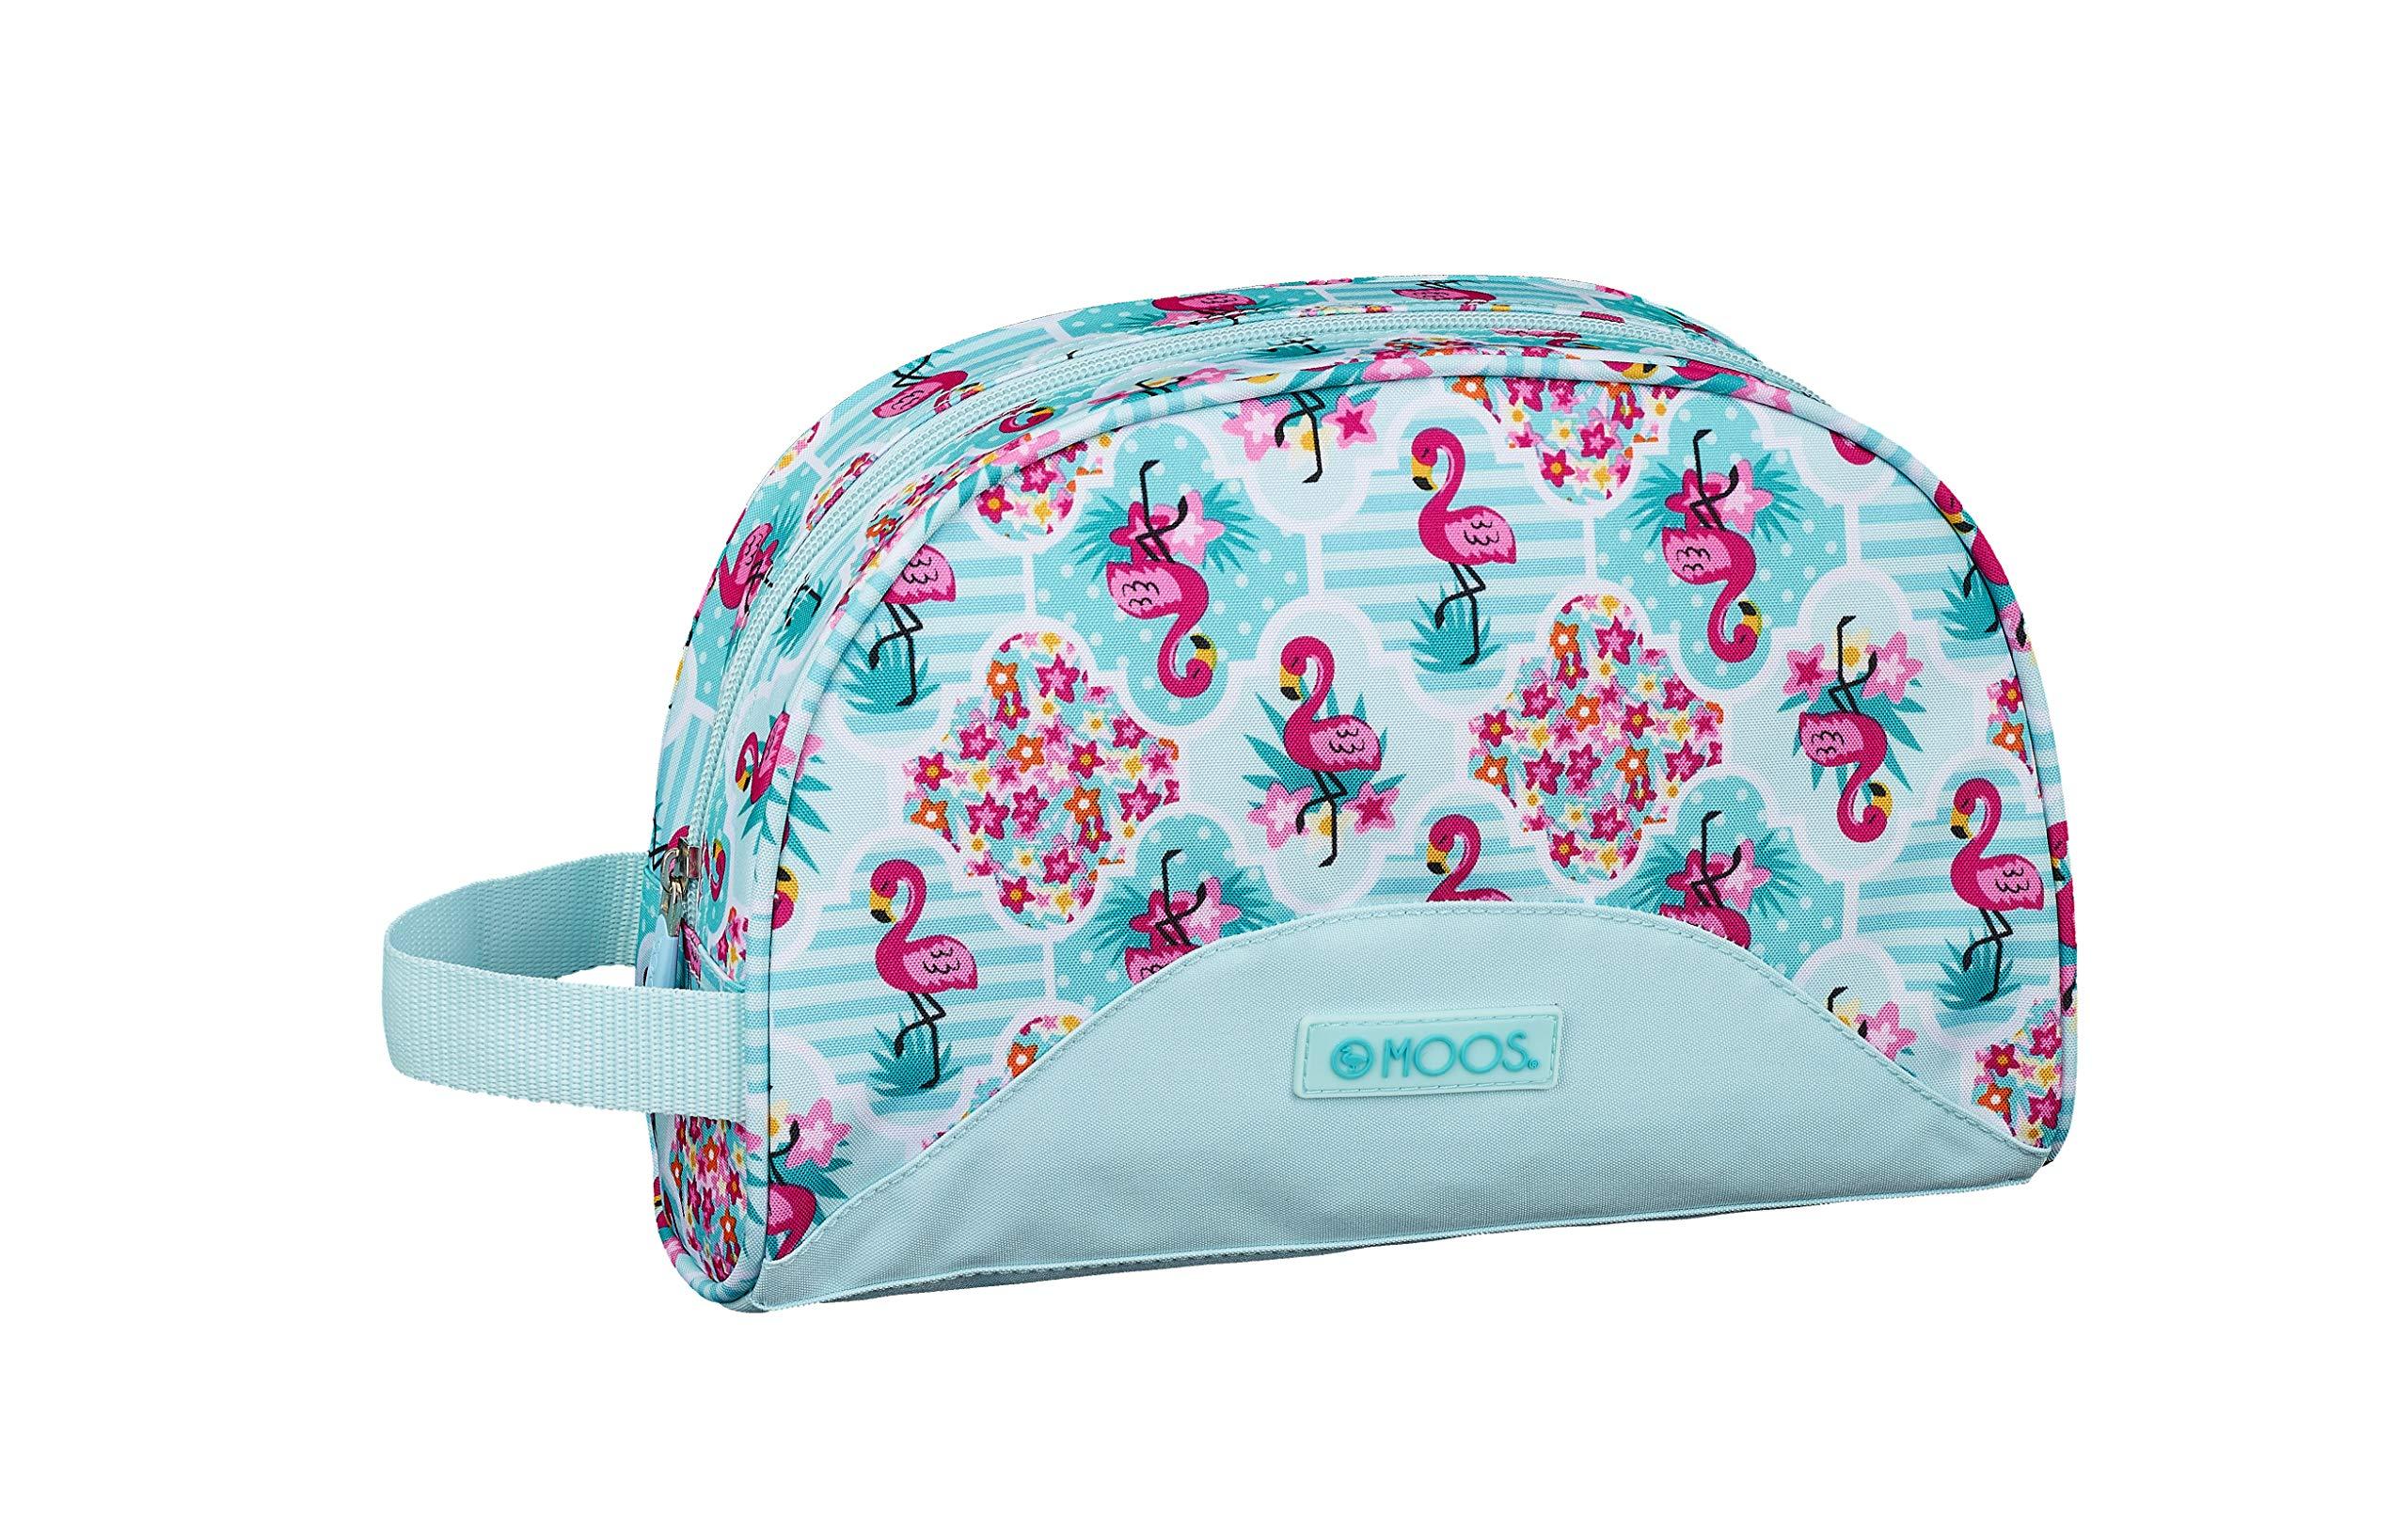 Moos  Flamingo Turquoise Oficial Mochila Escolar Infantil Pequeño Con Asa 280x100x180mm